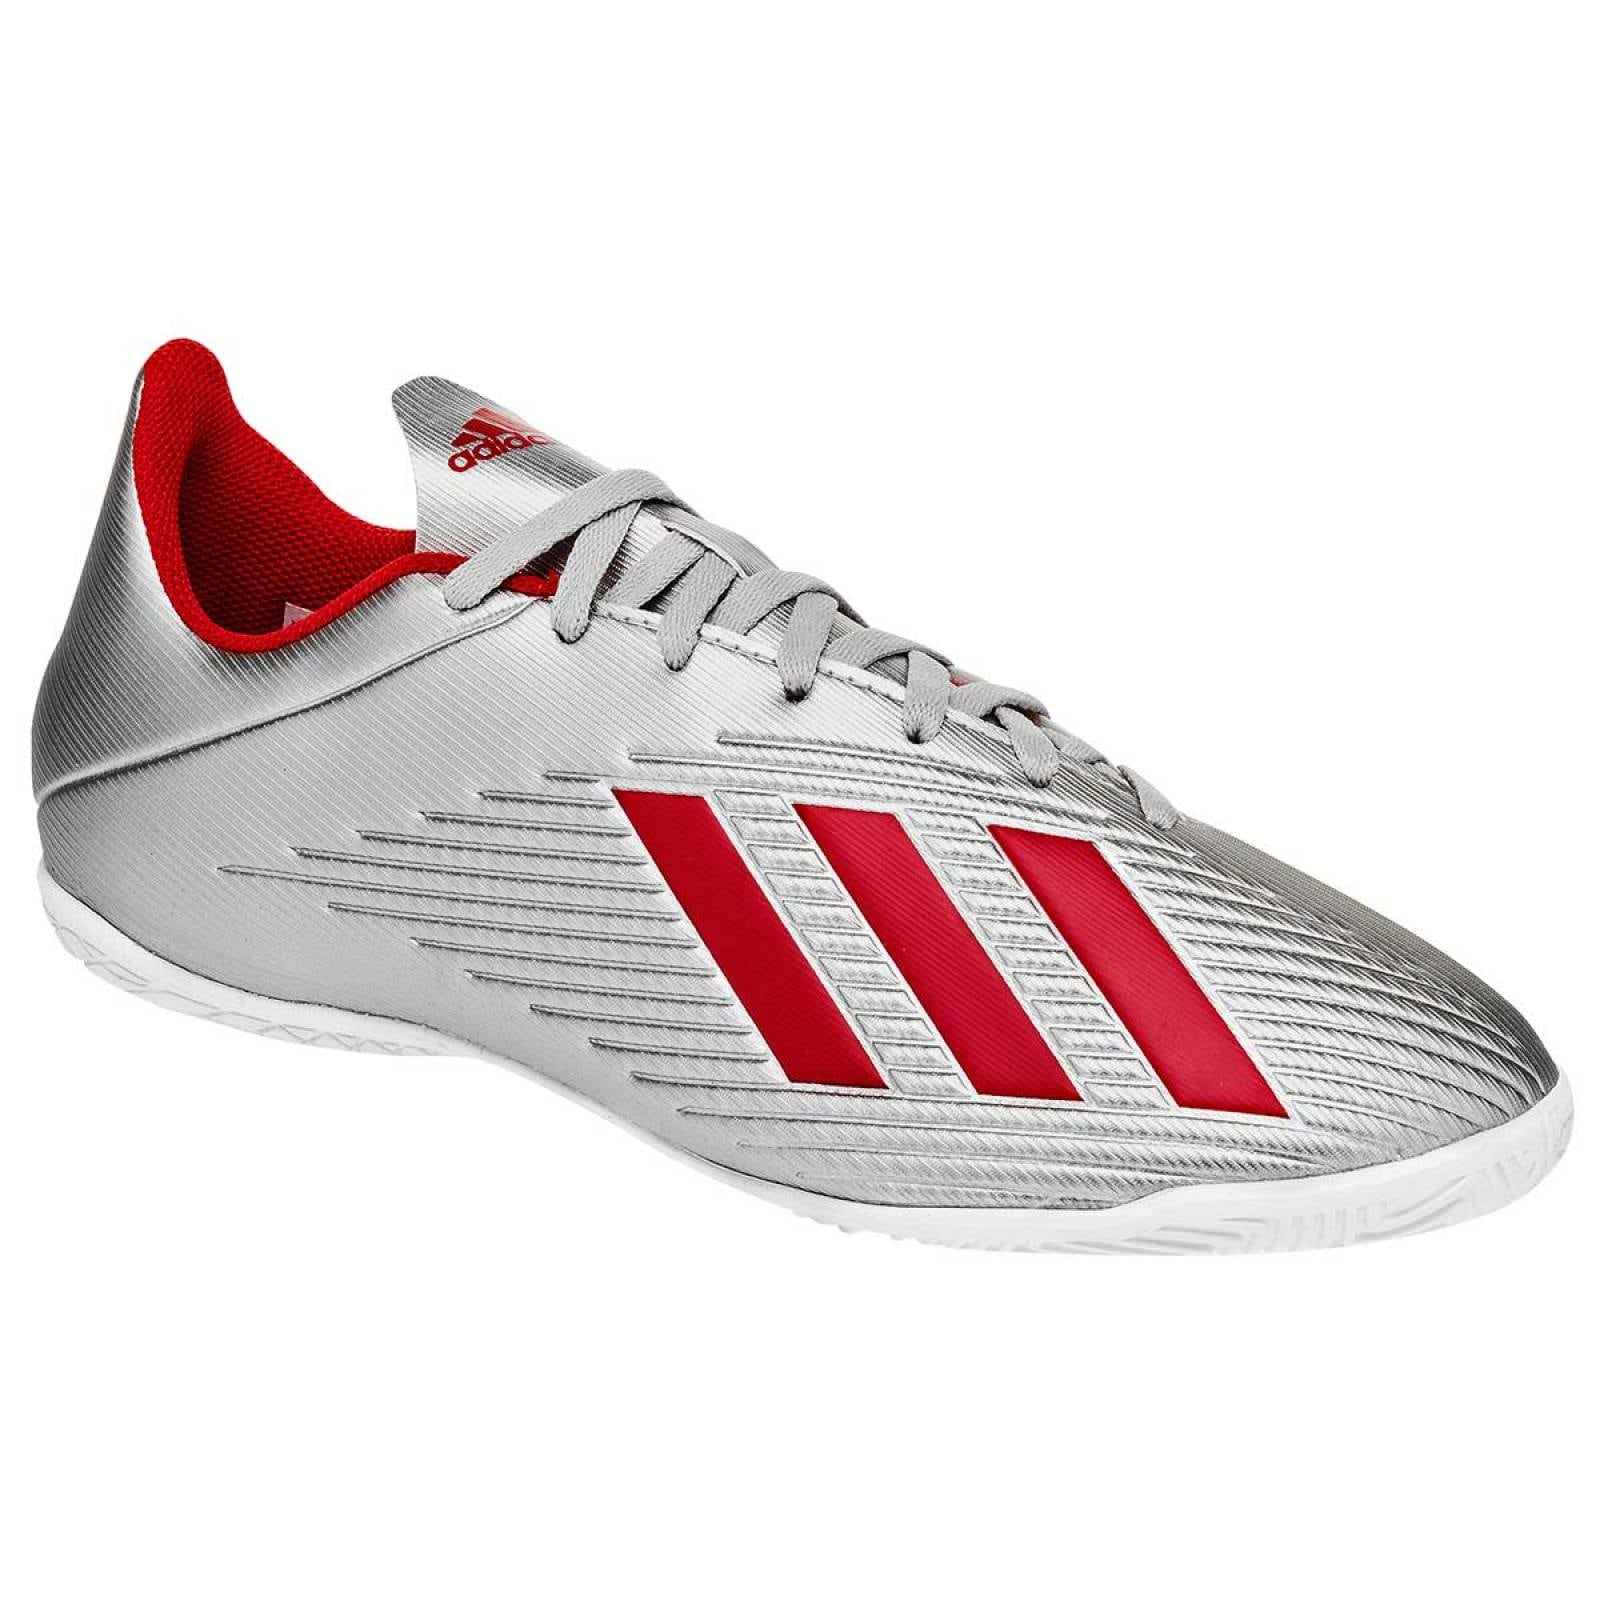 Adidas Tenis Hombre Plata rojo